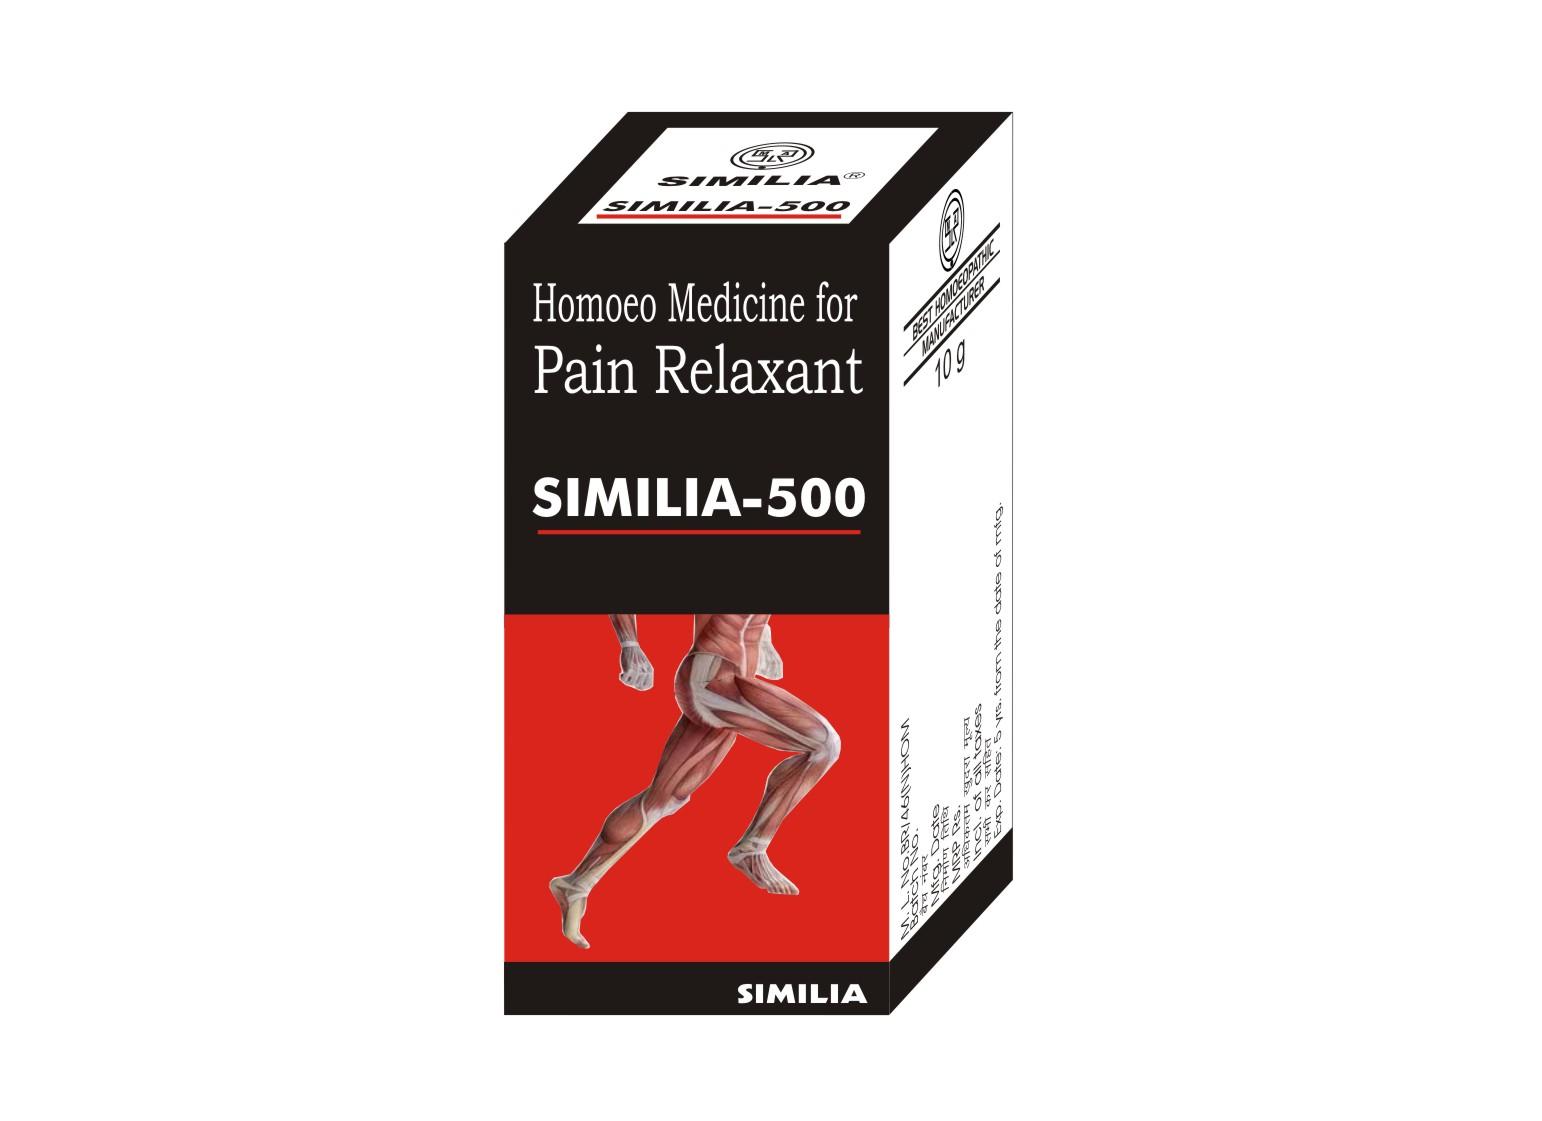 Similia - 500 (Pain Relaxant Balm) (10g)